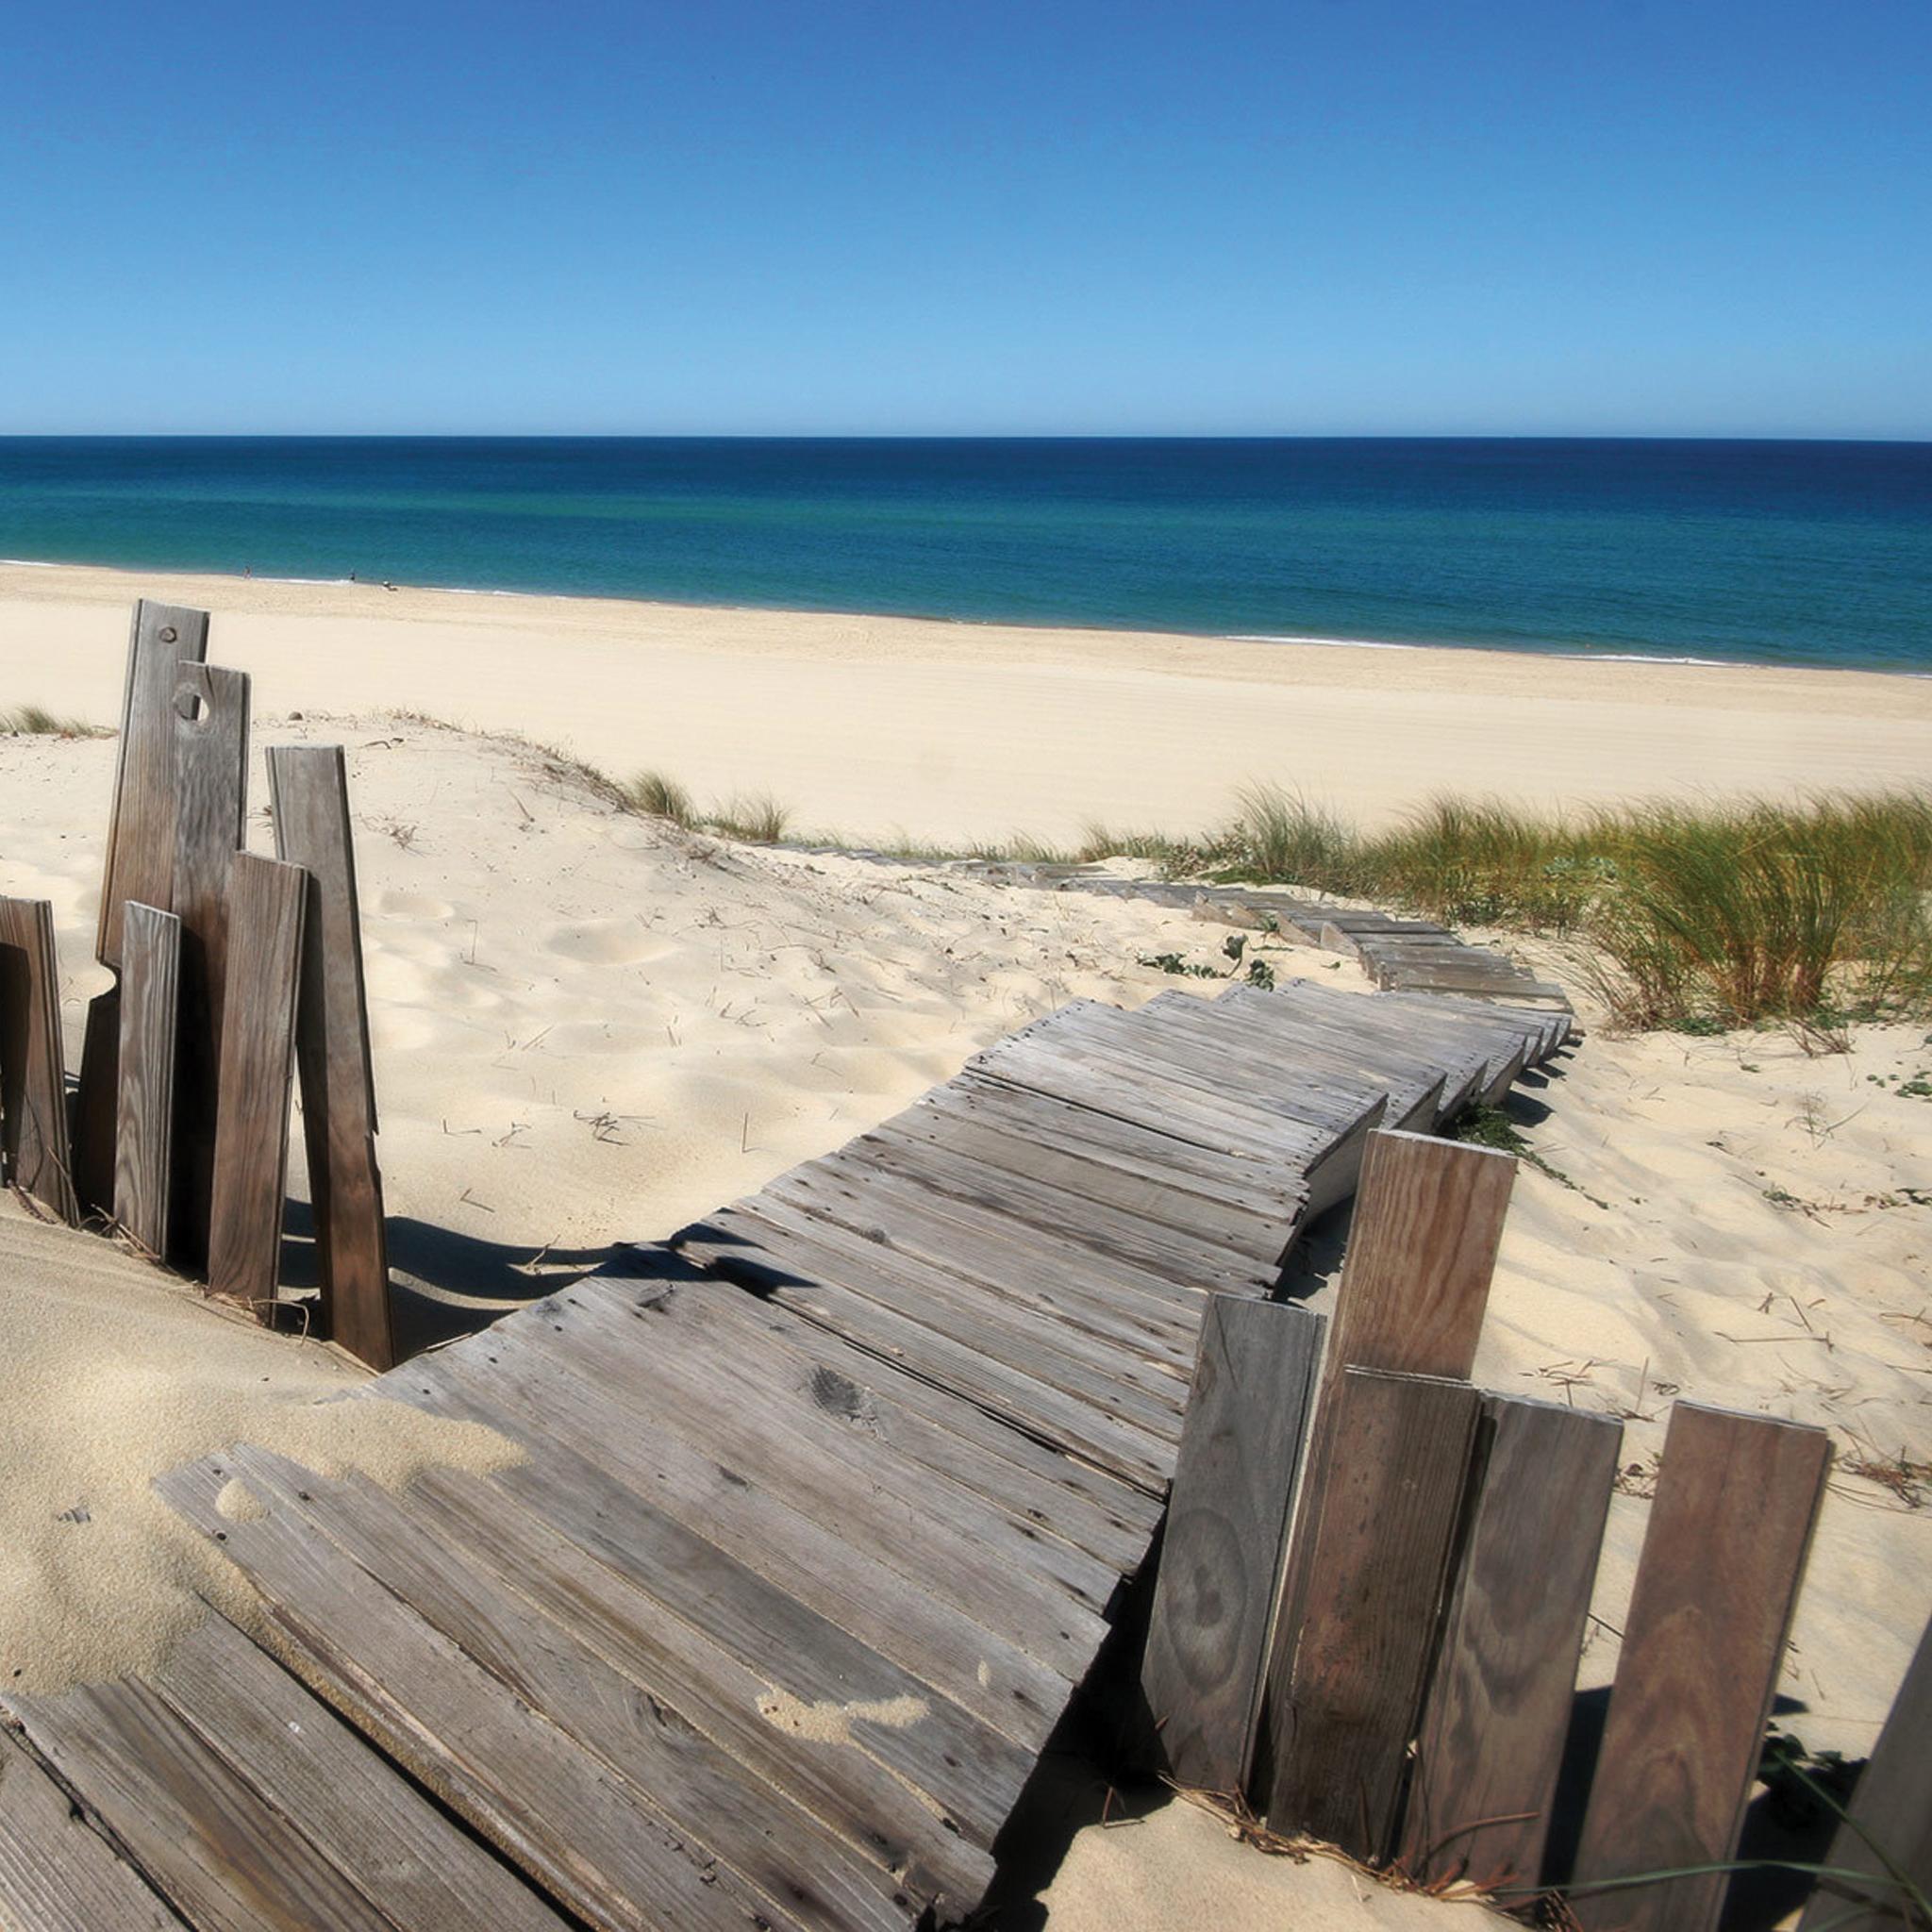 Beach-Way-3Wallpapers-iPad-Retina